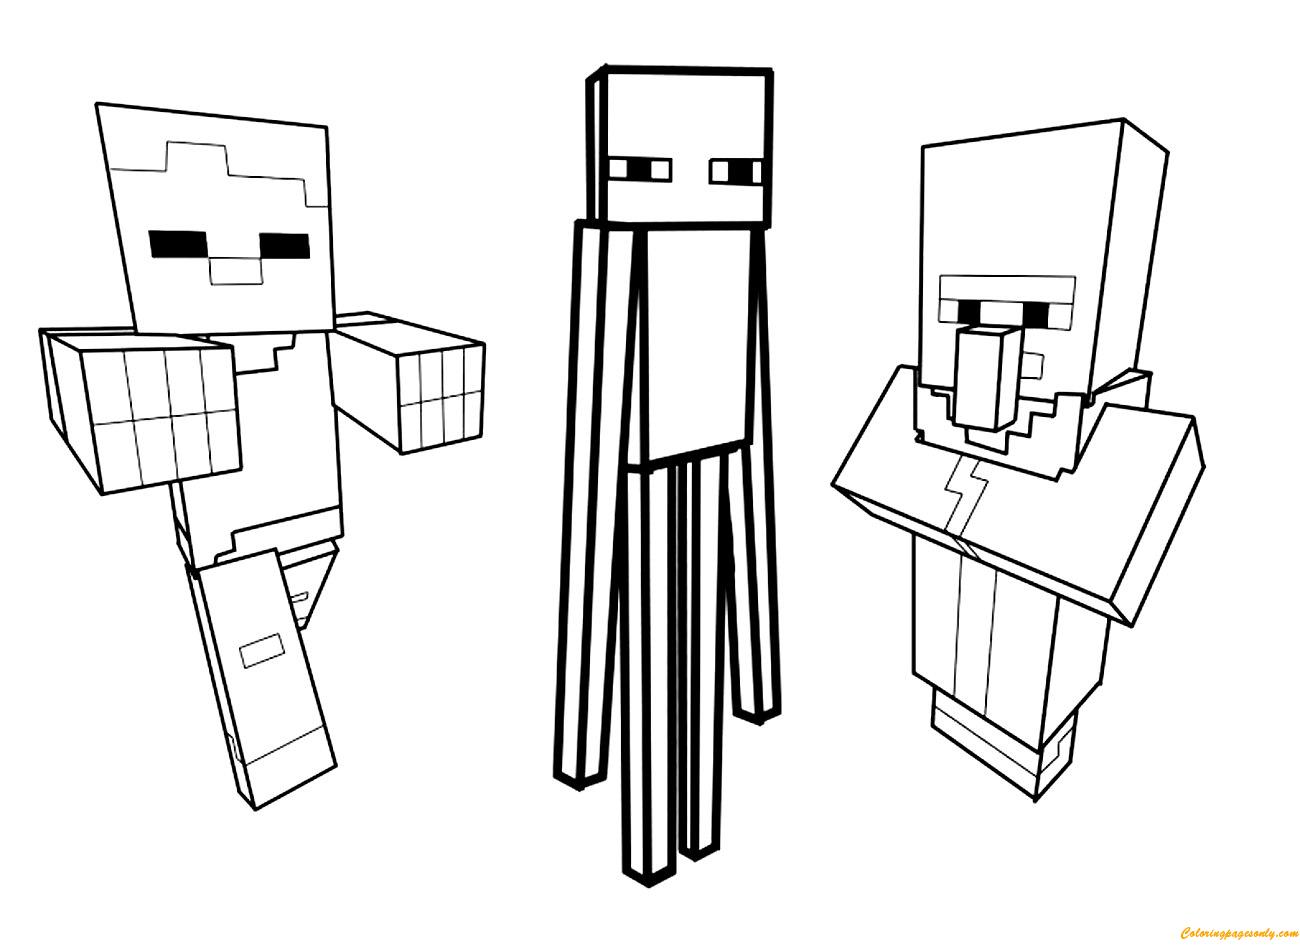 Minecraft Ausmalbilder Gratis : Minecraft Character Drawing Template Costumepartyrun